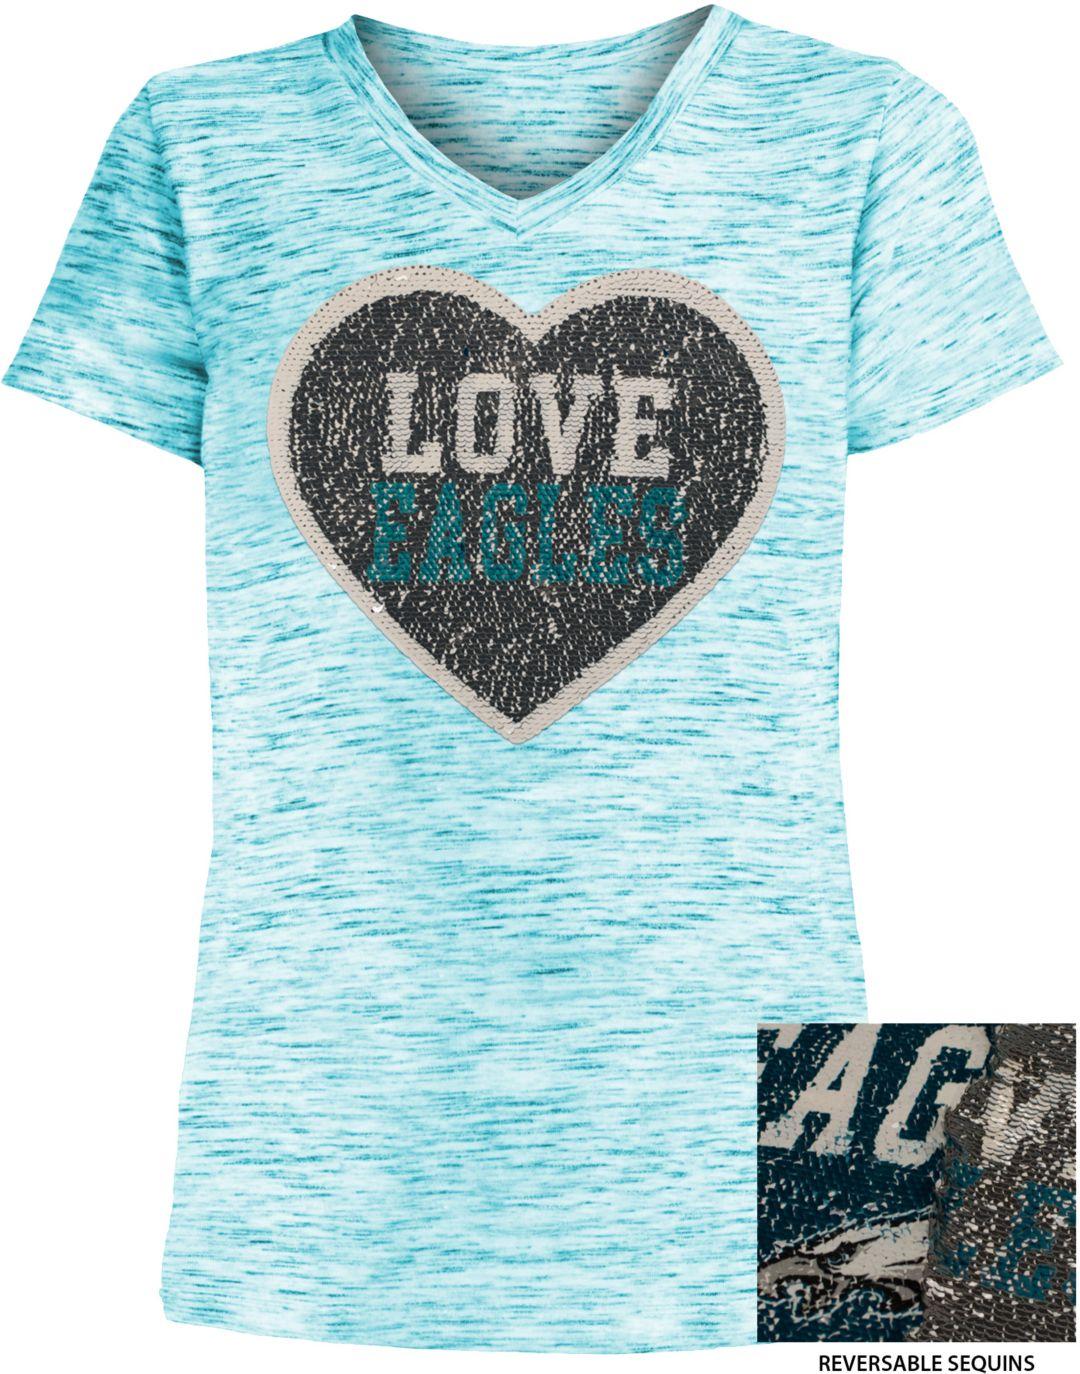 huge selection of 67987 b9c68 NFL Team Apparel Girls' Philadelphia Eagles Sequins Heart Green Reversible  T-Shirt